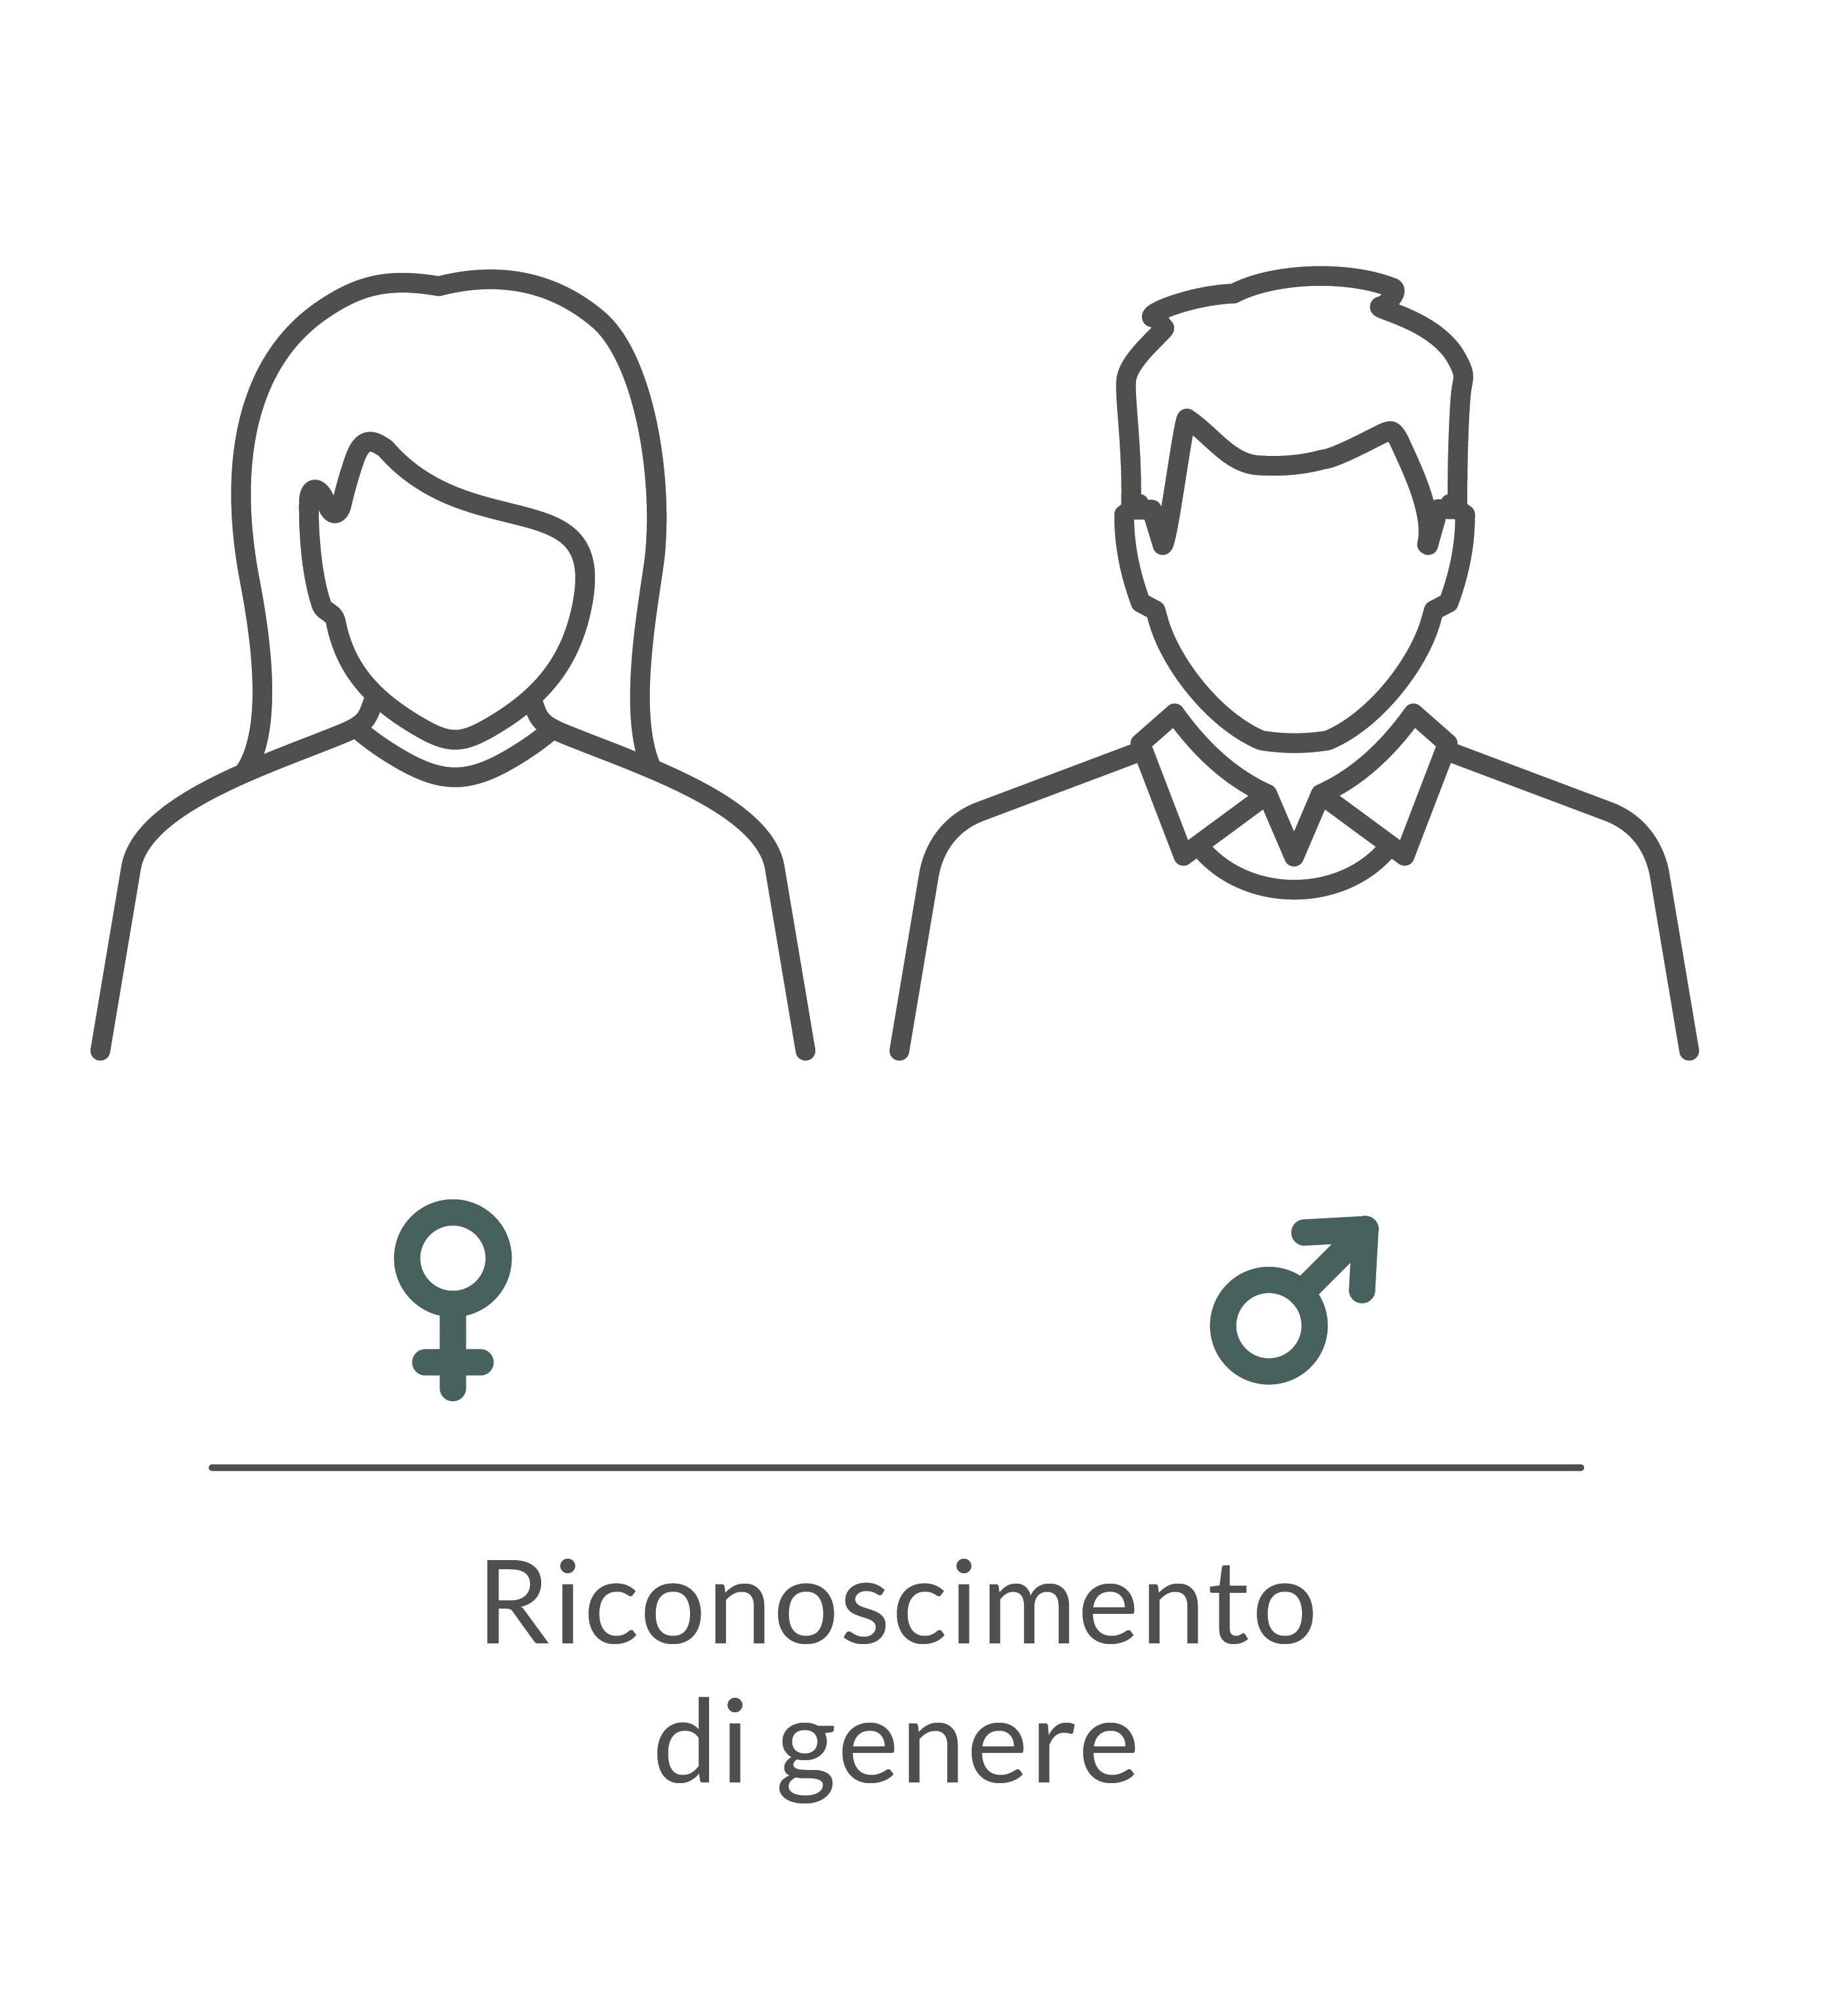 riconoscimento gender (maschio/femmina)